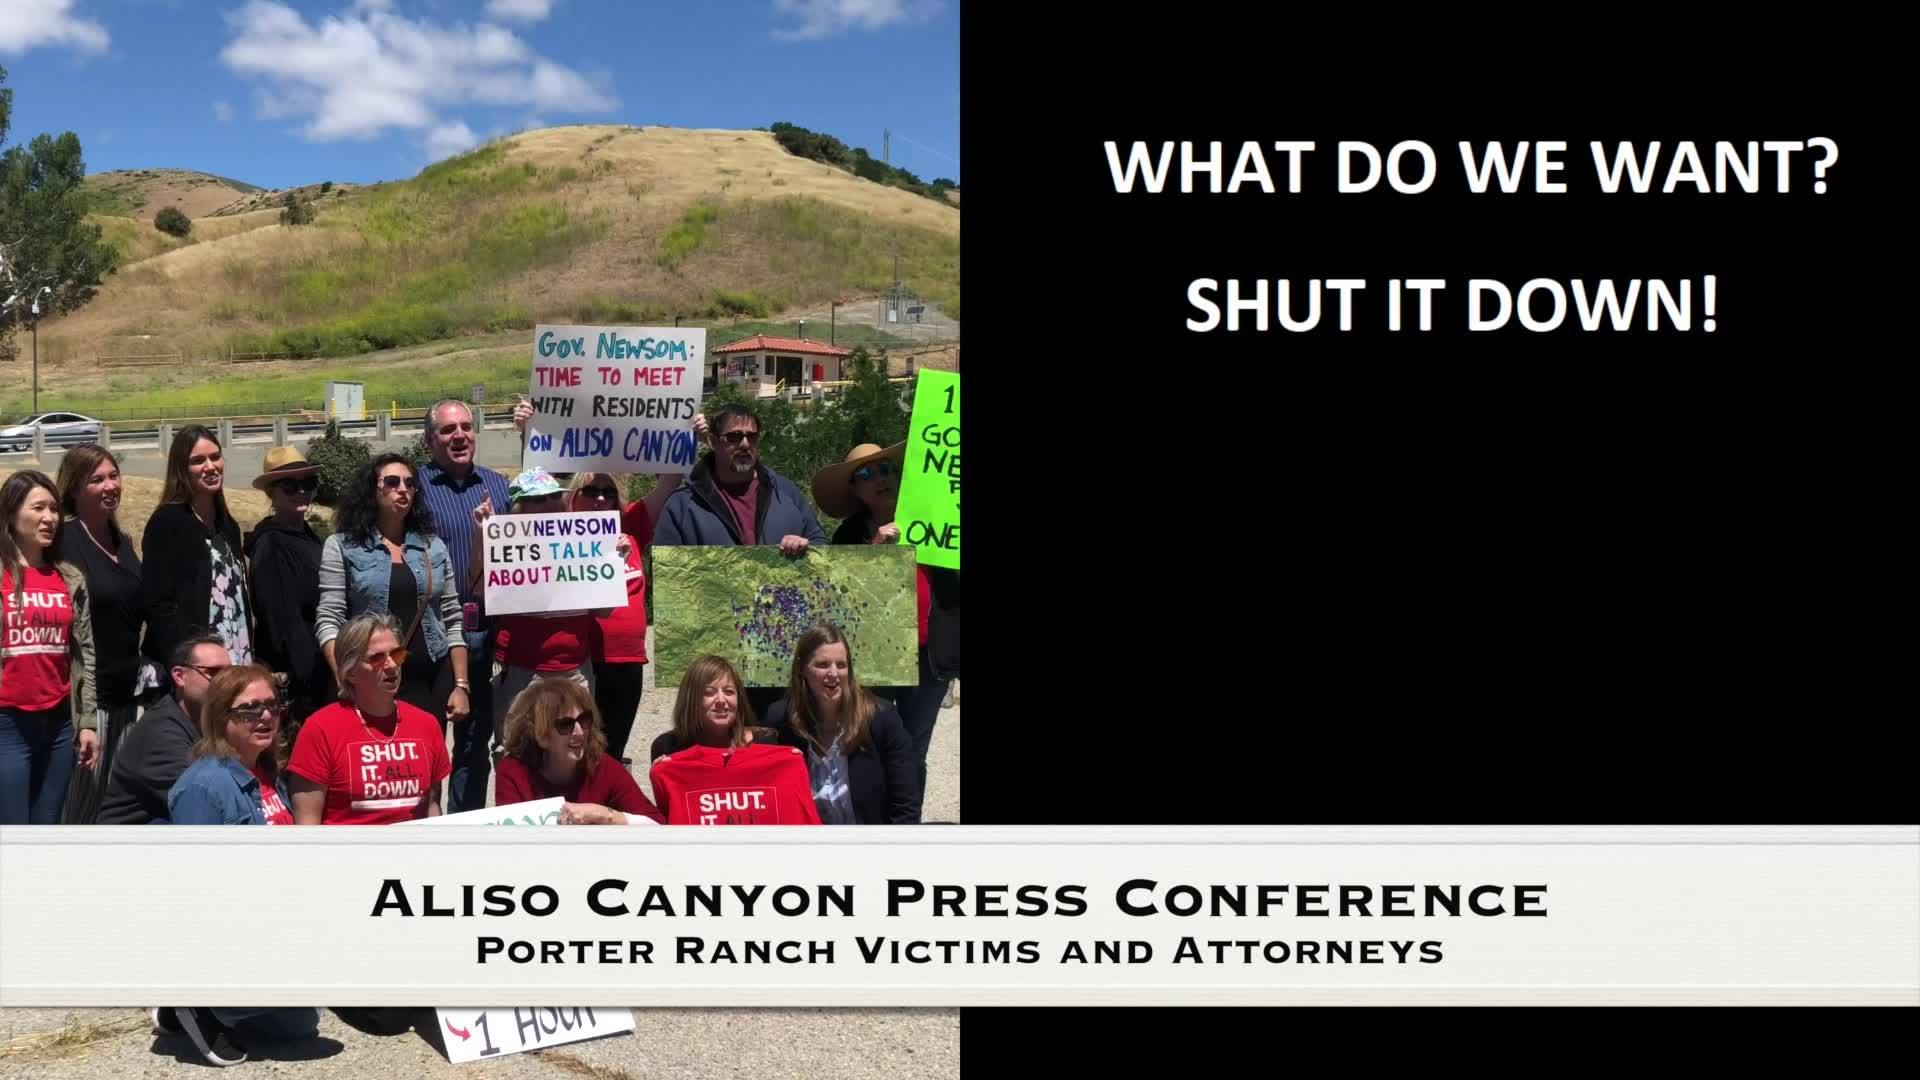 Aliso Canyon... SHUT IT DOWN.. SHUT IT DOWN!